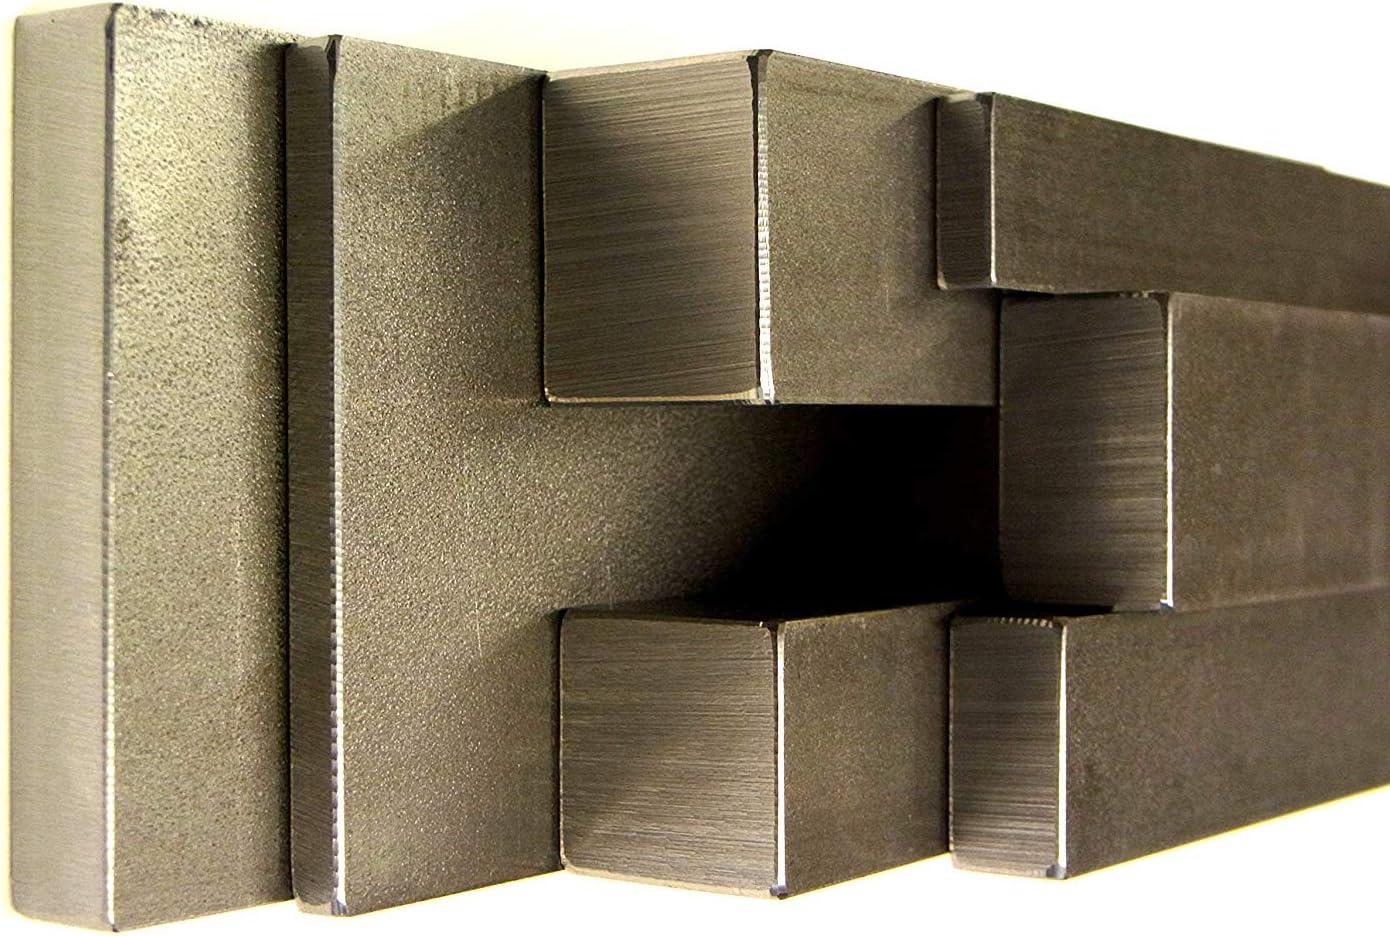 Flachstahl S235 JRC+C St37 25x20x500 DIN 10277 DIN 10278 Flacheisen Bandstahl Flachmaterial